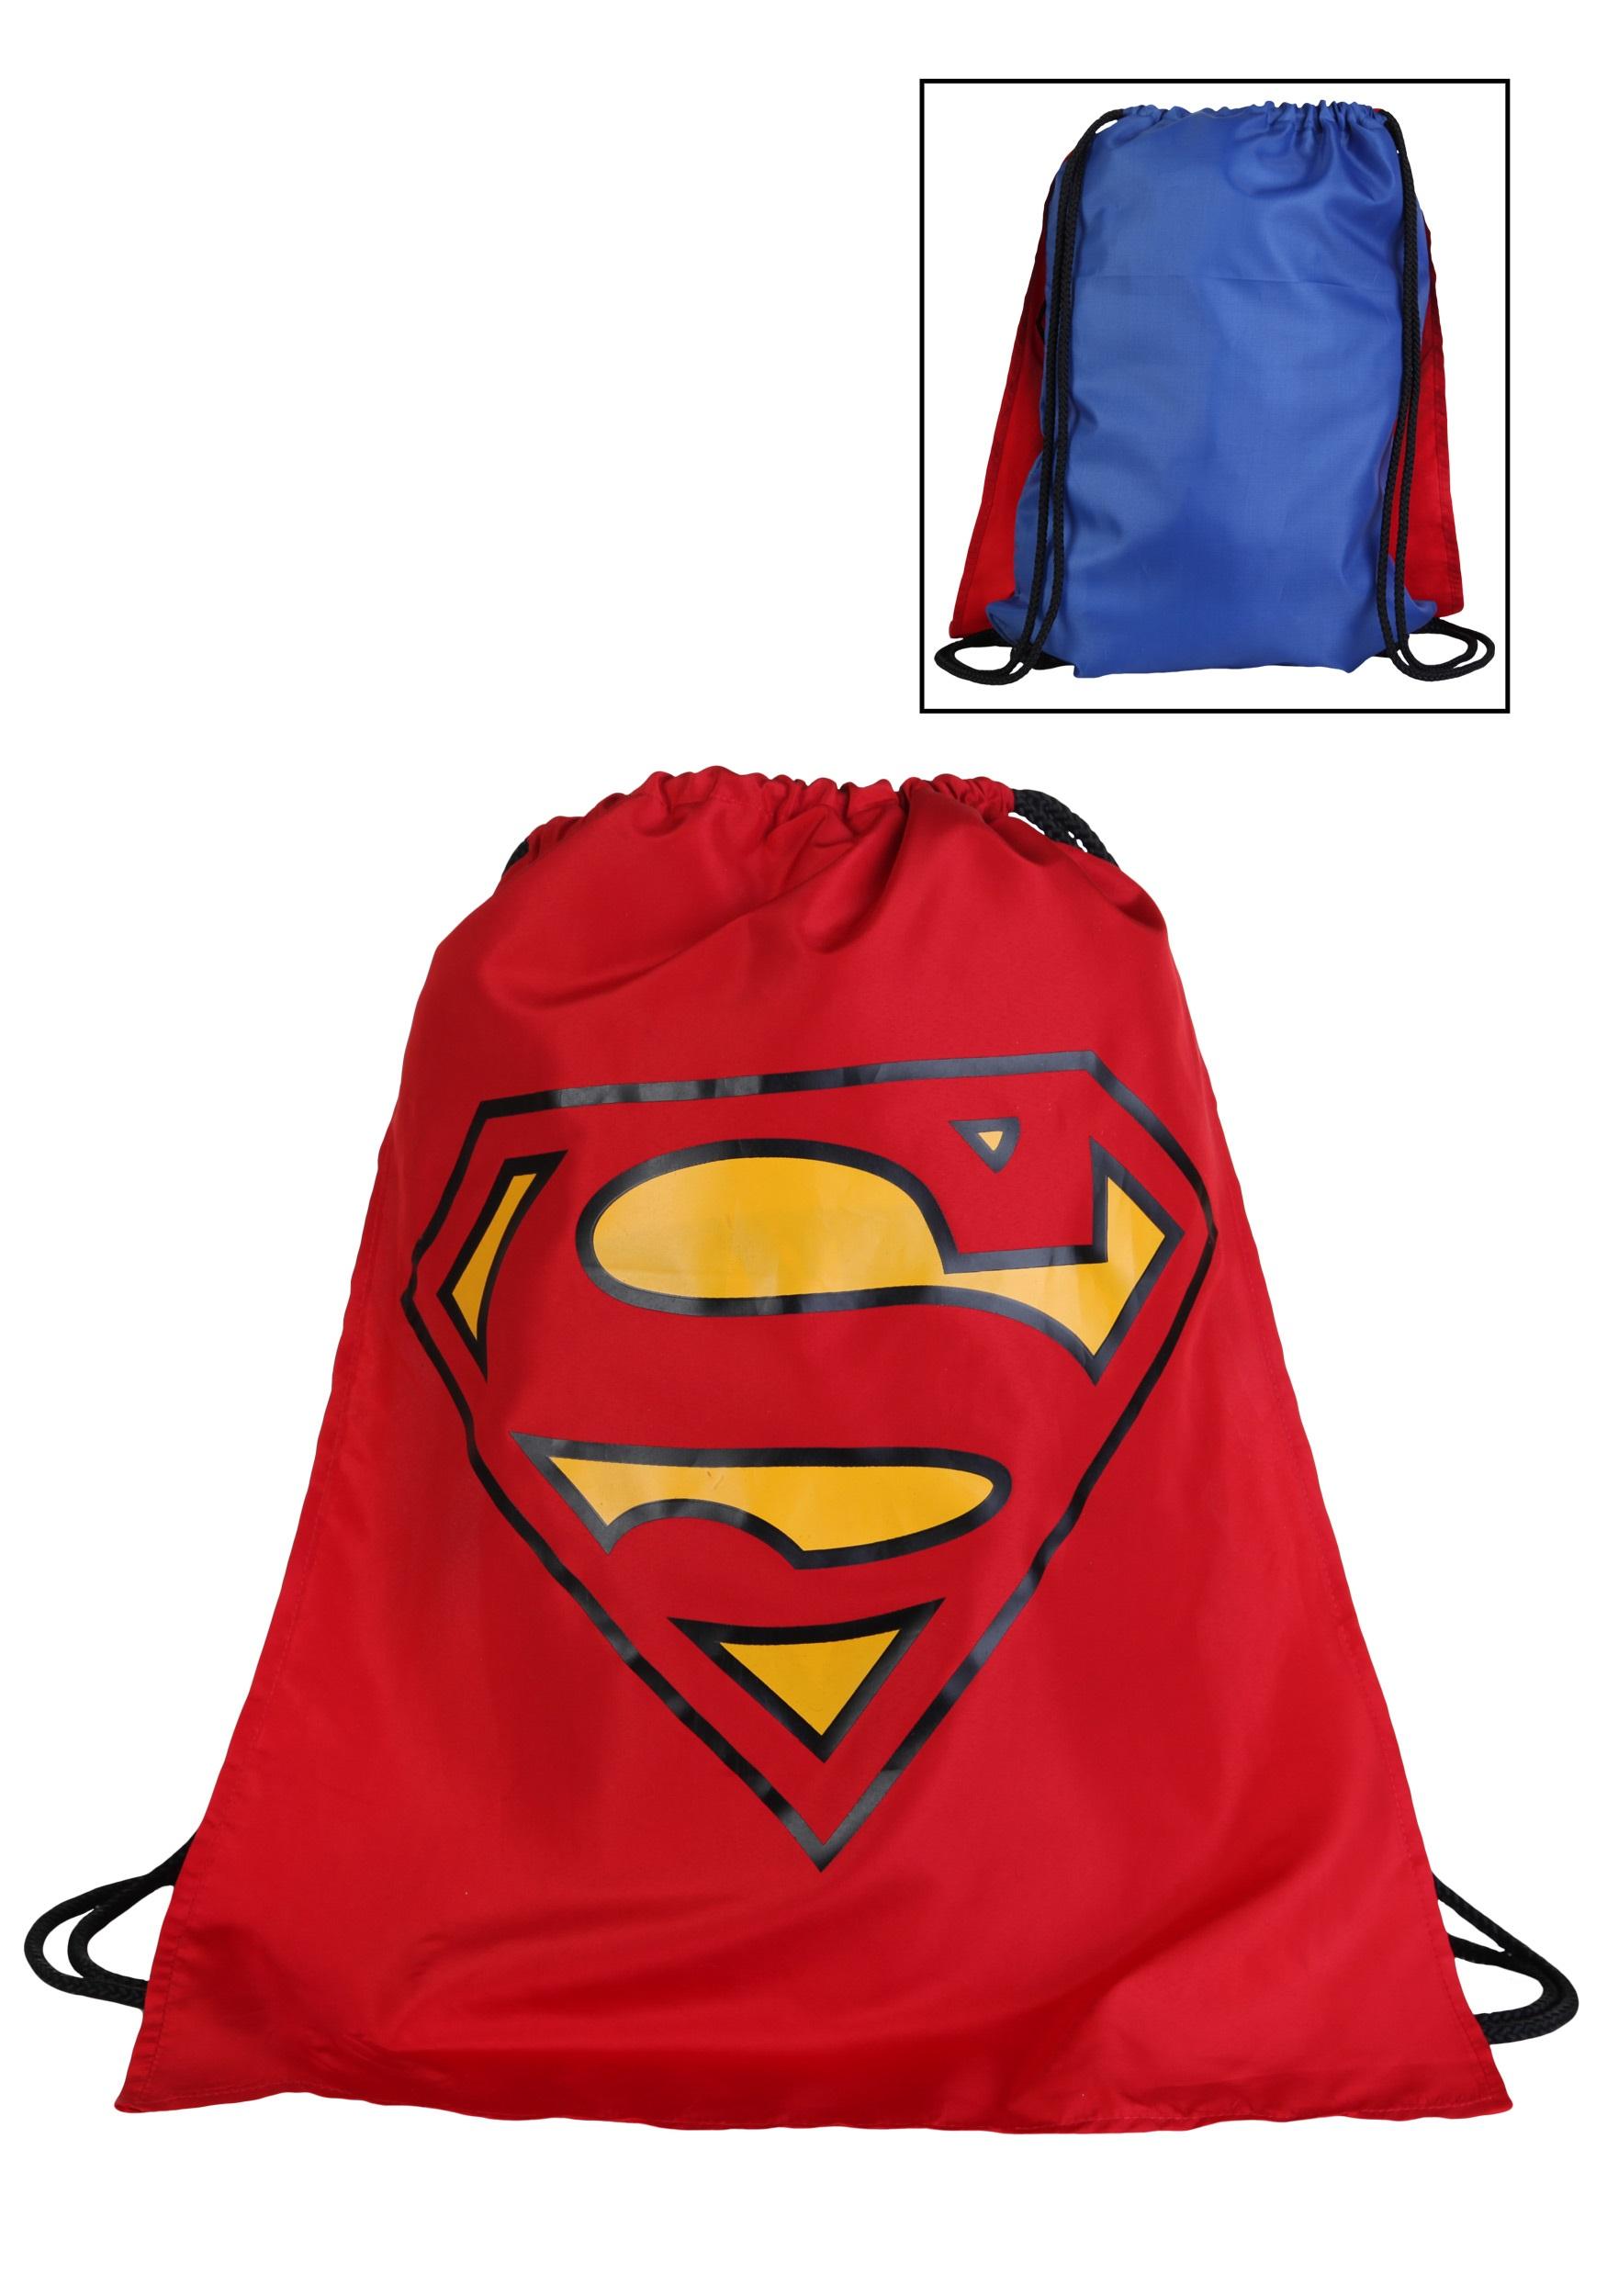 Superman Cape Logo | Clipart Panda - Free Clipart Images